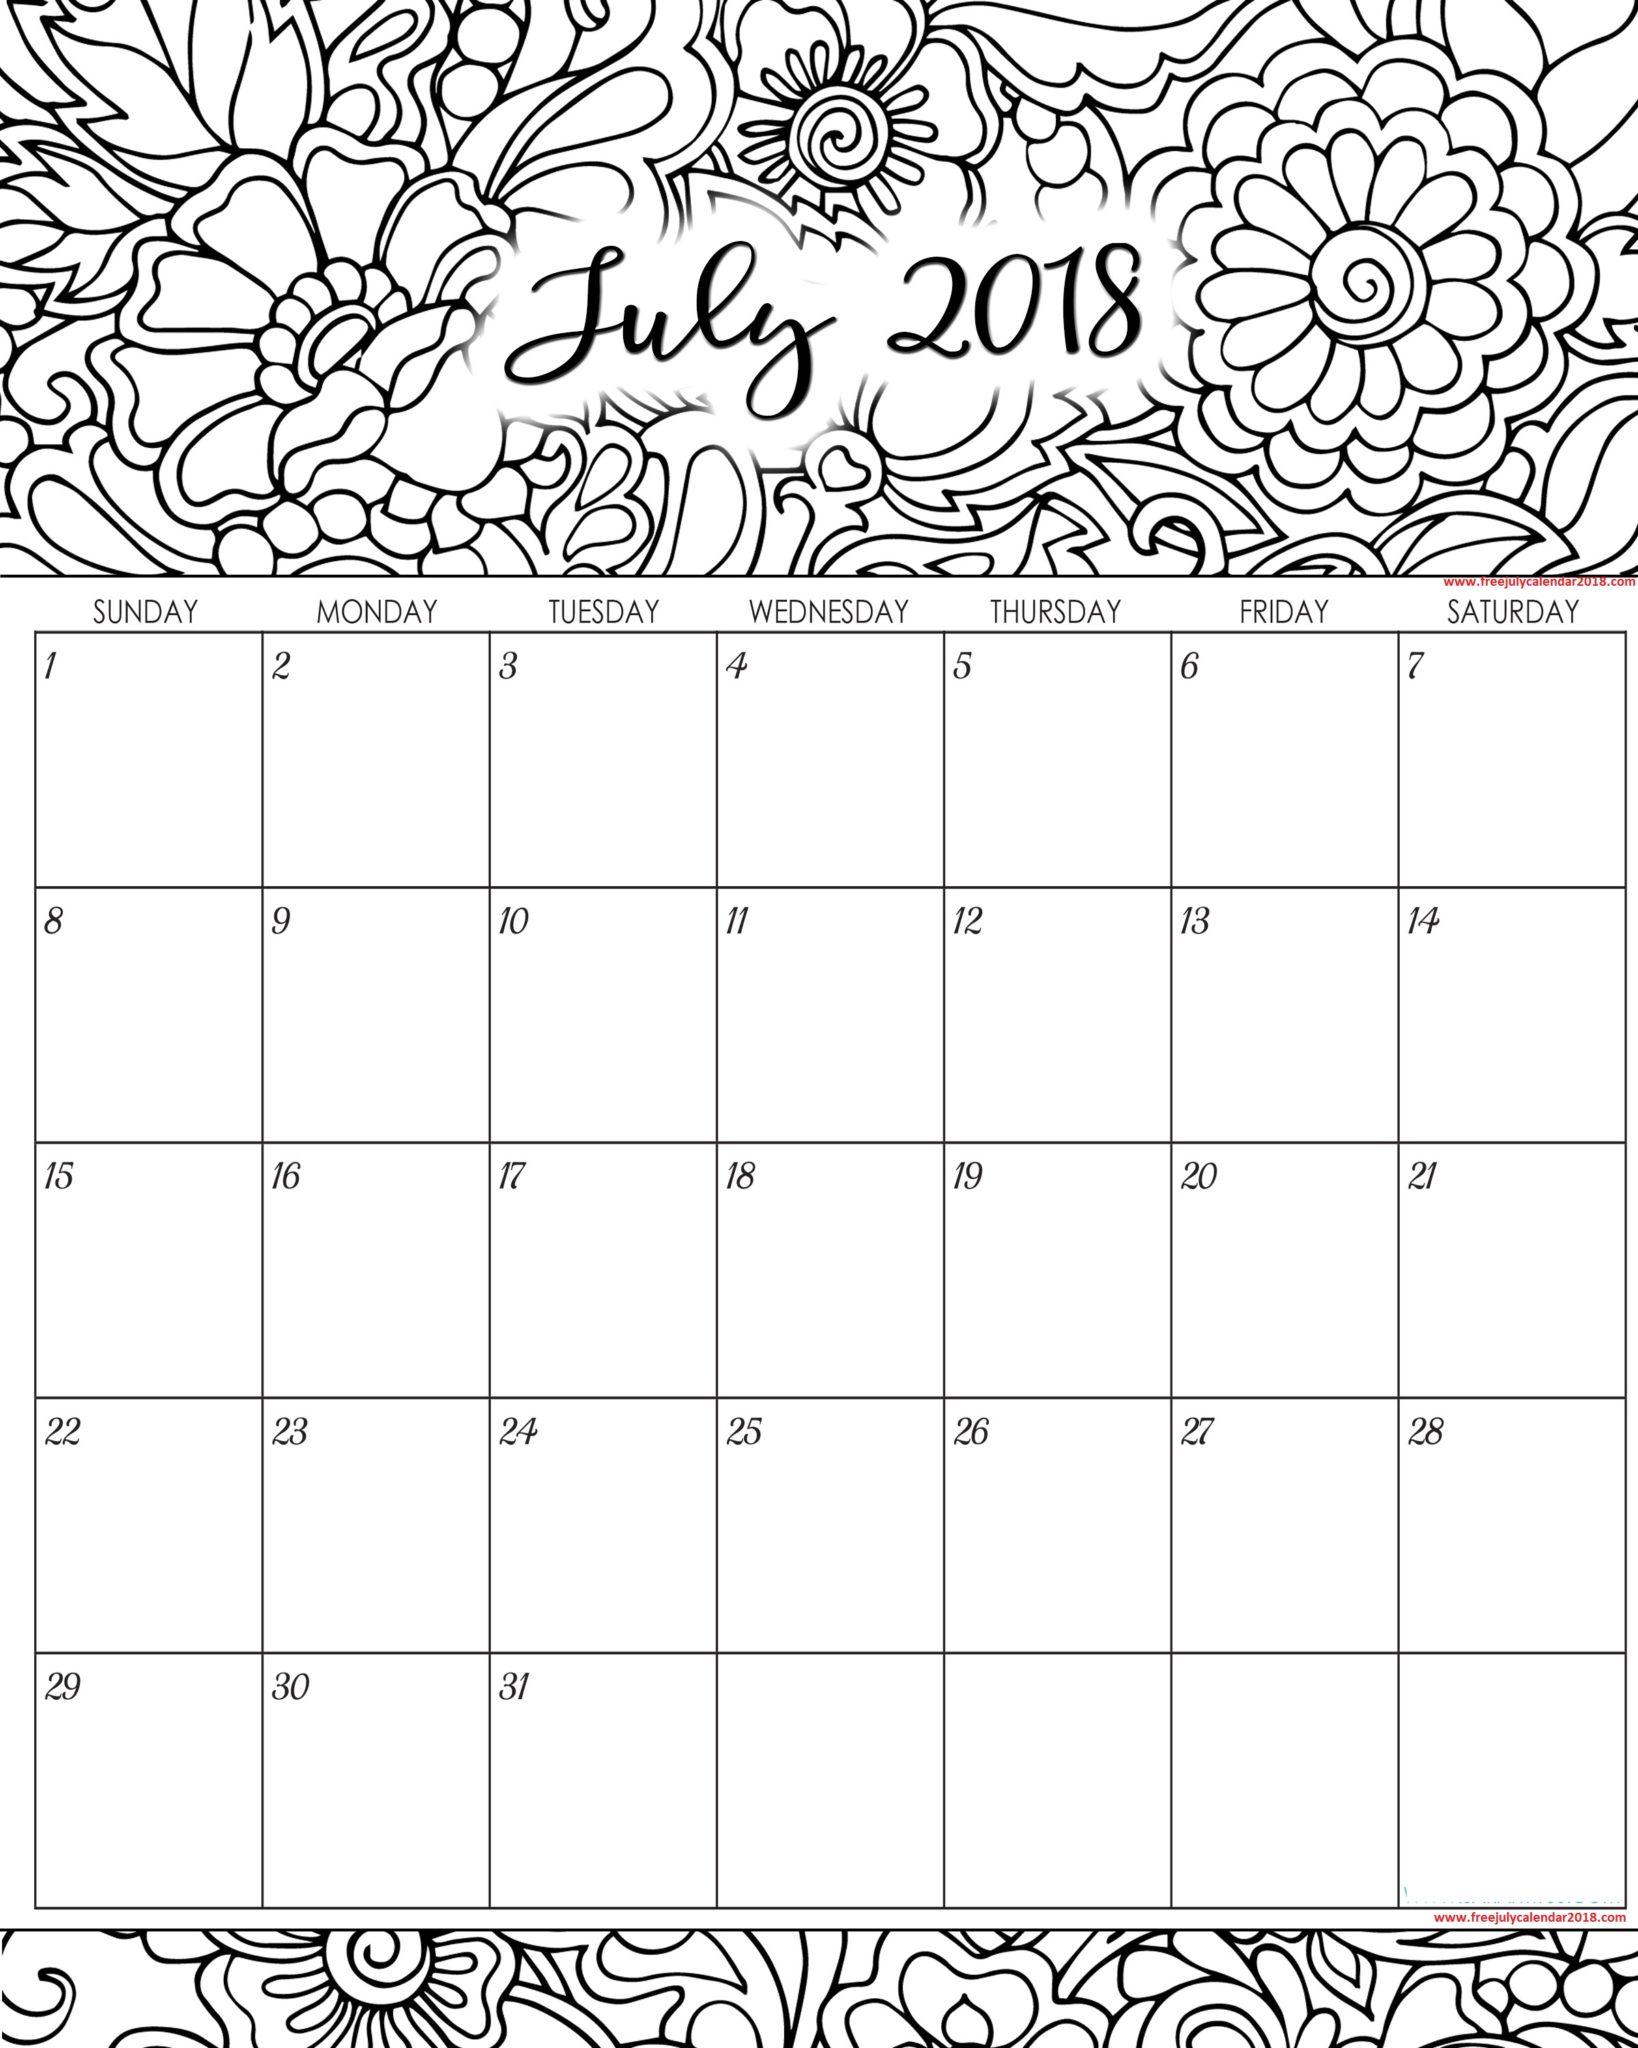 60 Free July Calendar Printable Blank Templates